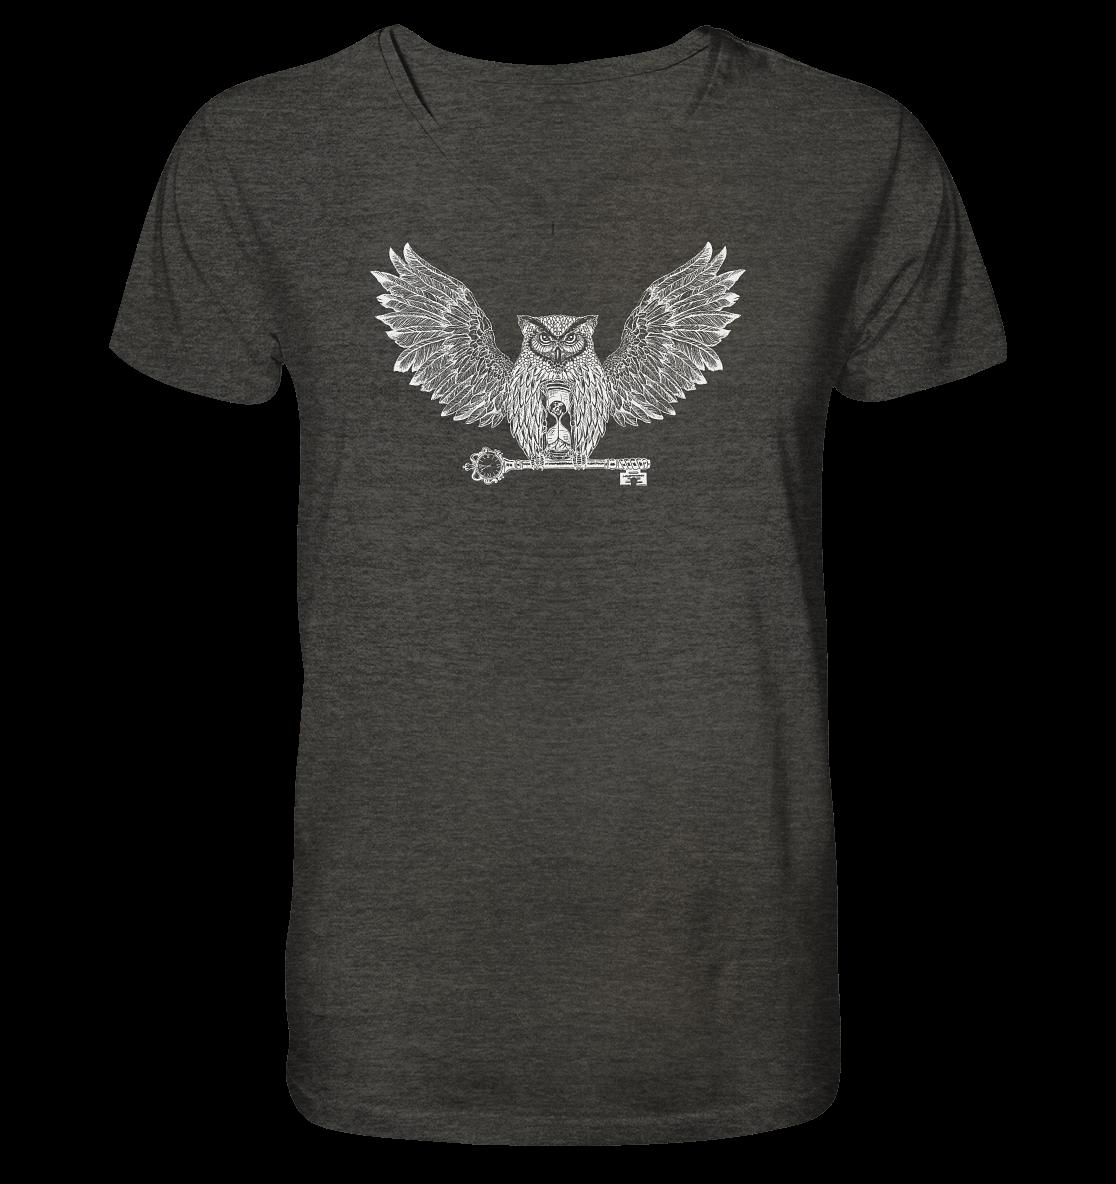 front-mens-organic-v-neck-shirt-252625-1116x-3.png